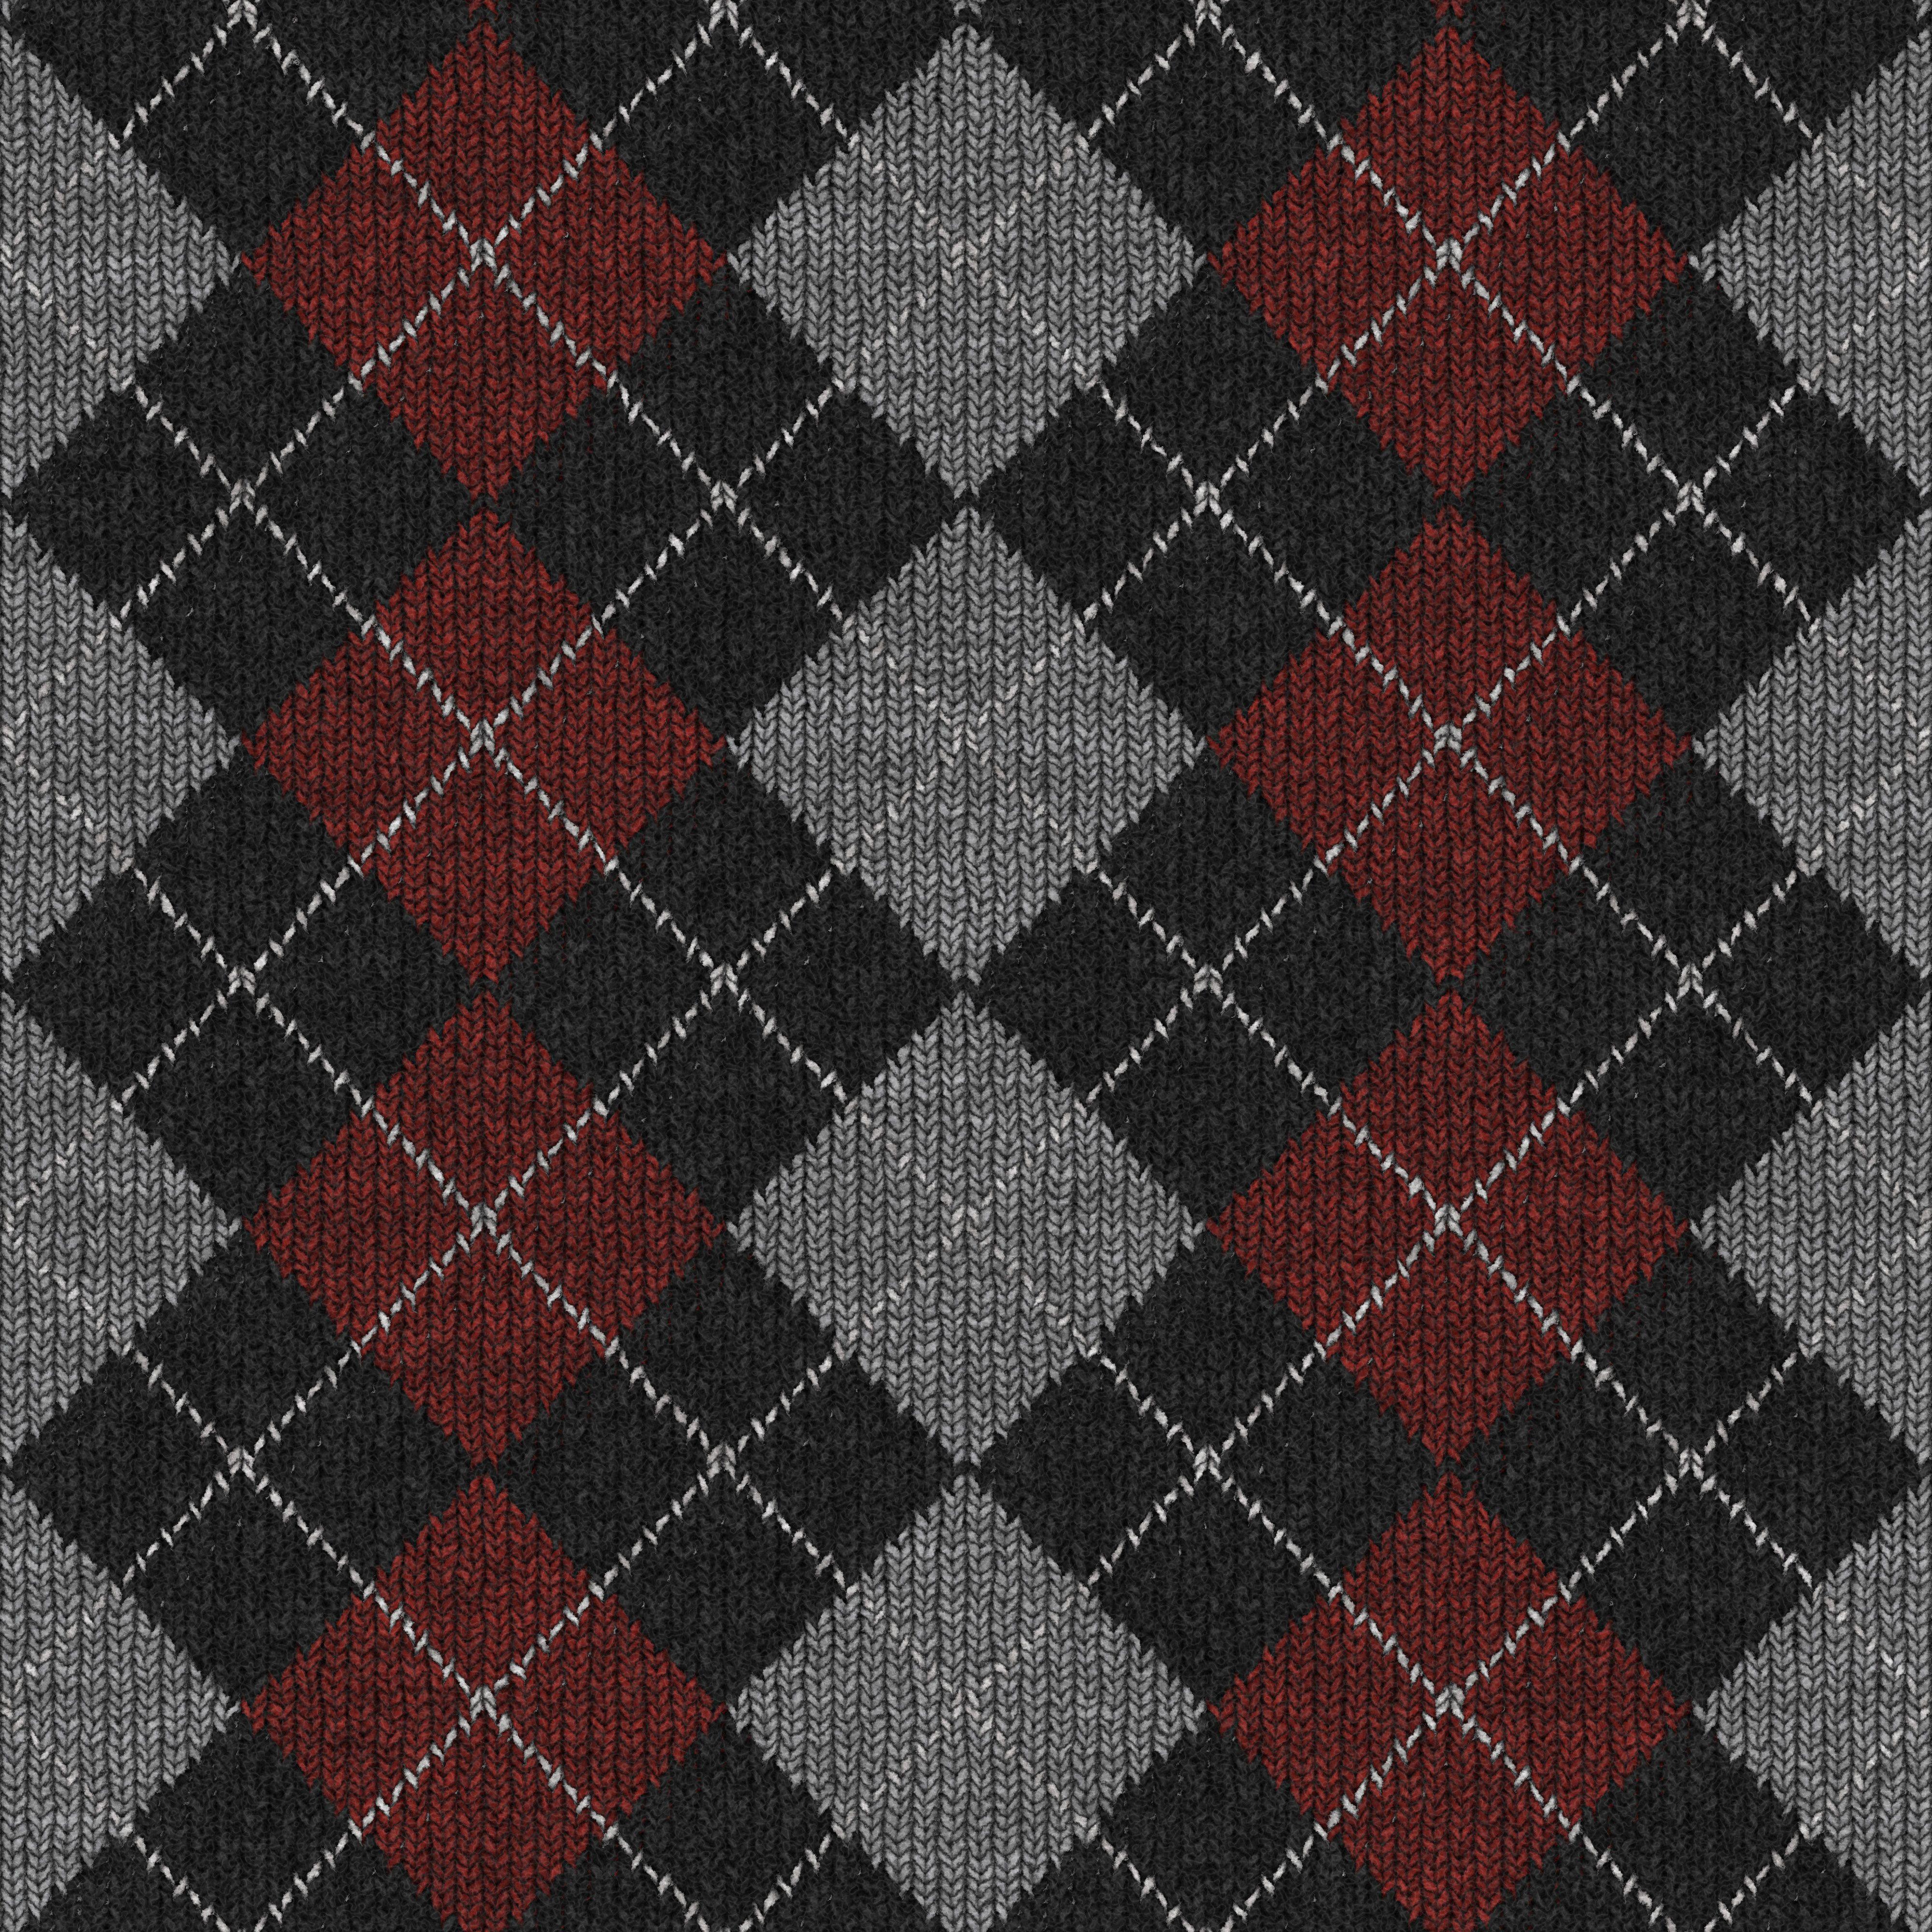 fabric background